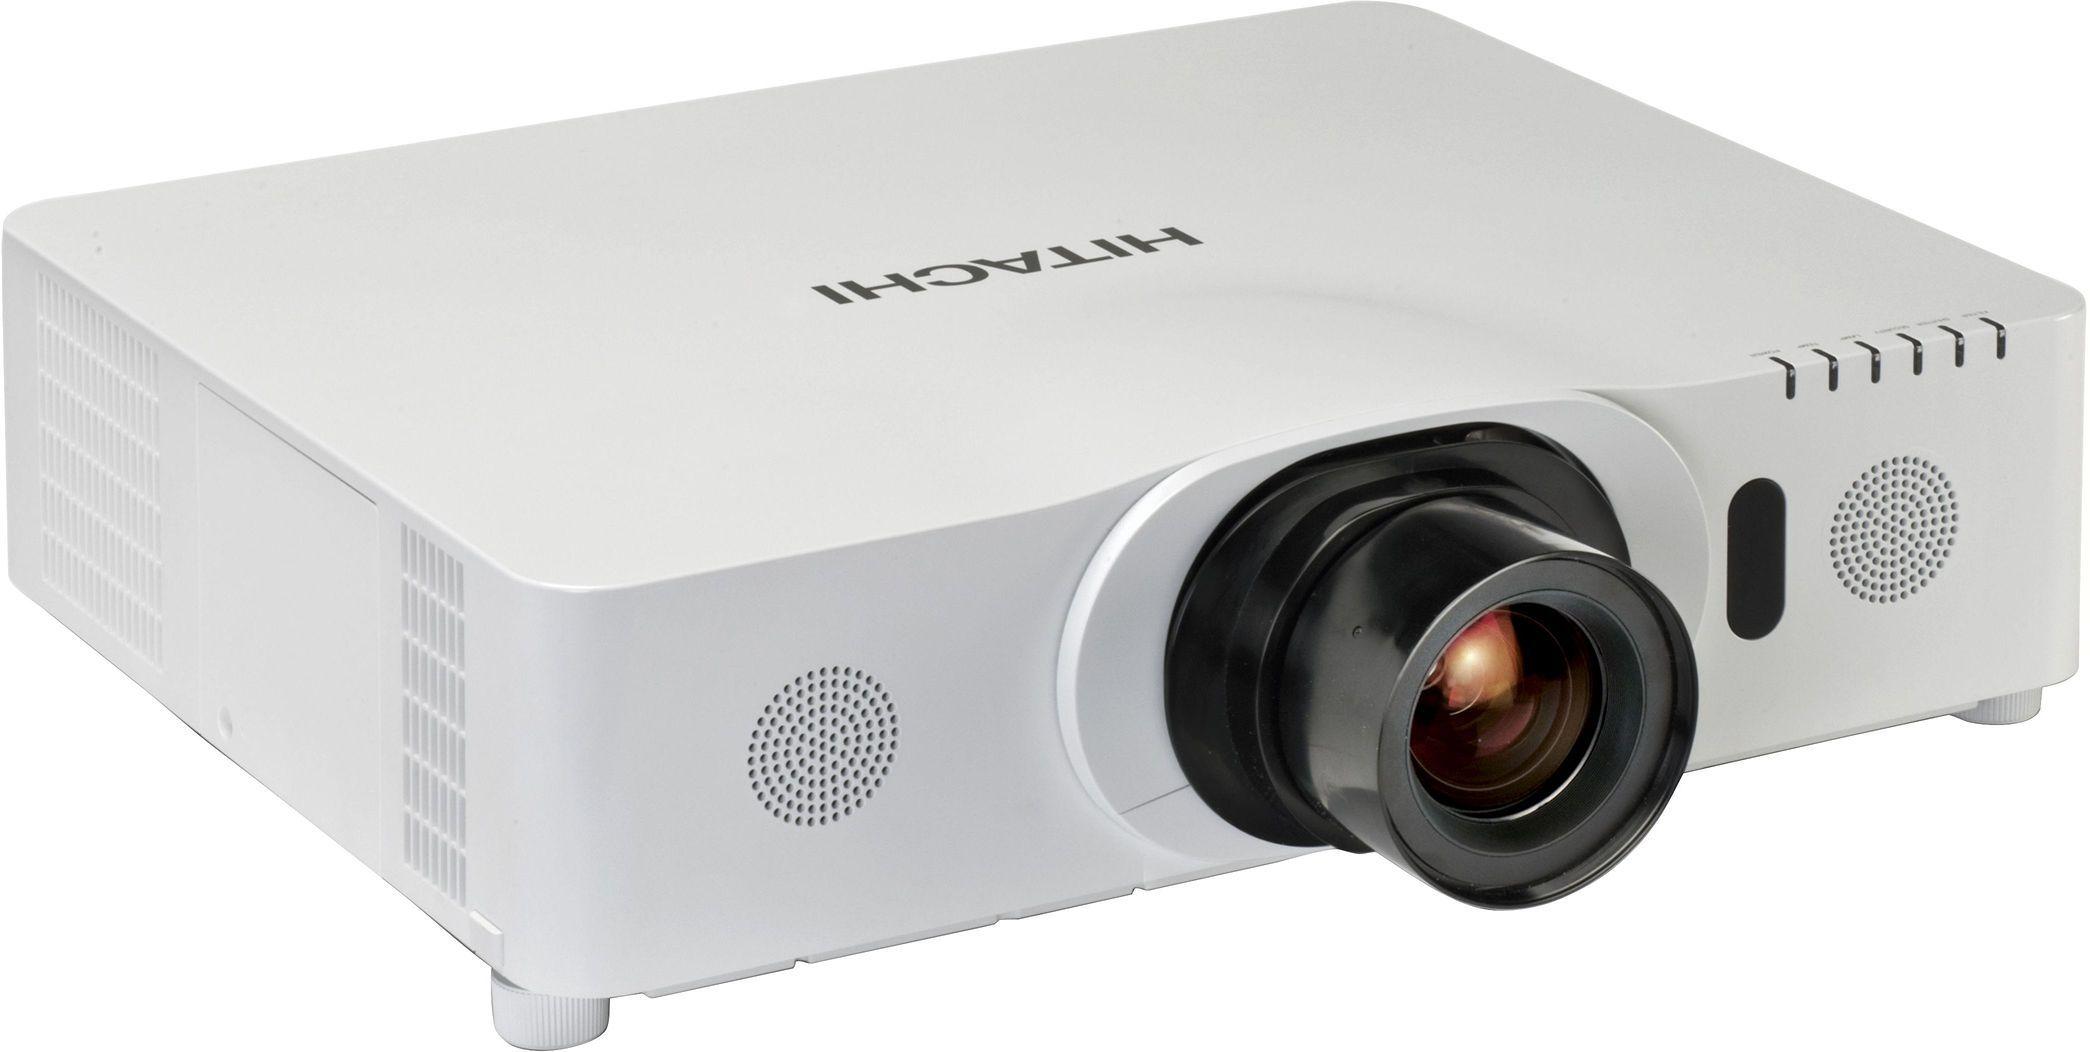 Hitachi CP-WU8440-R 3LCD Projector, Refurbished